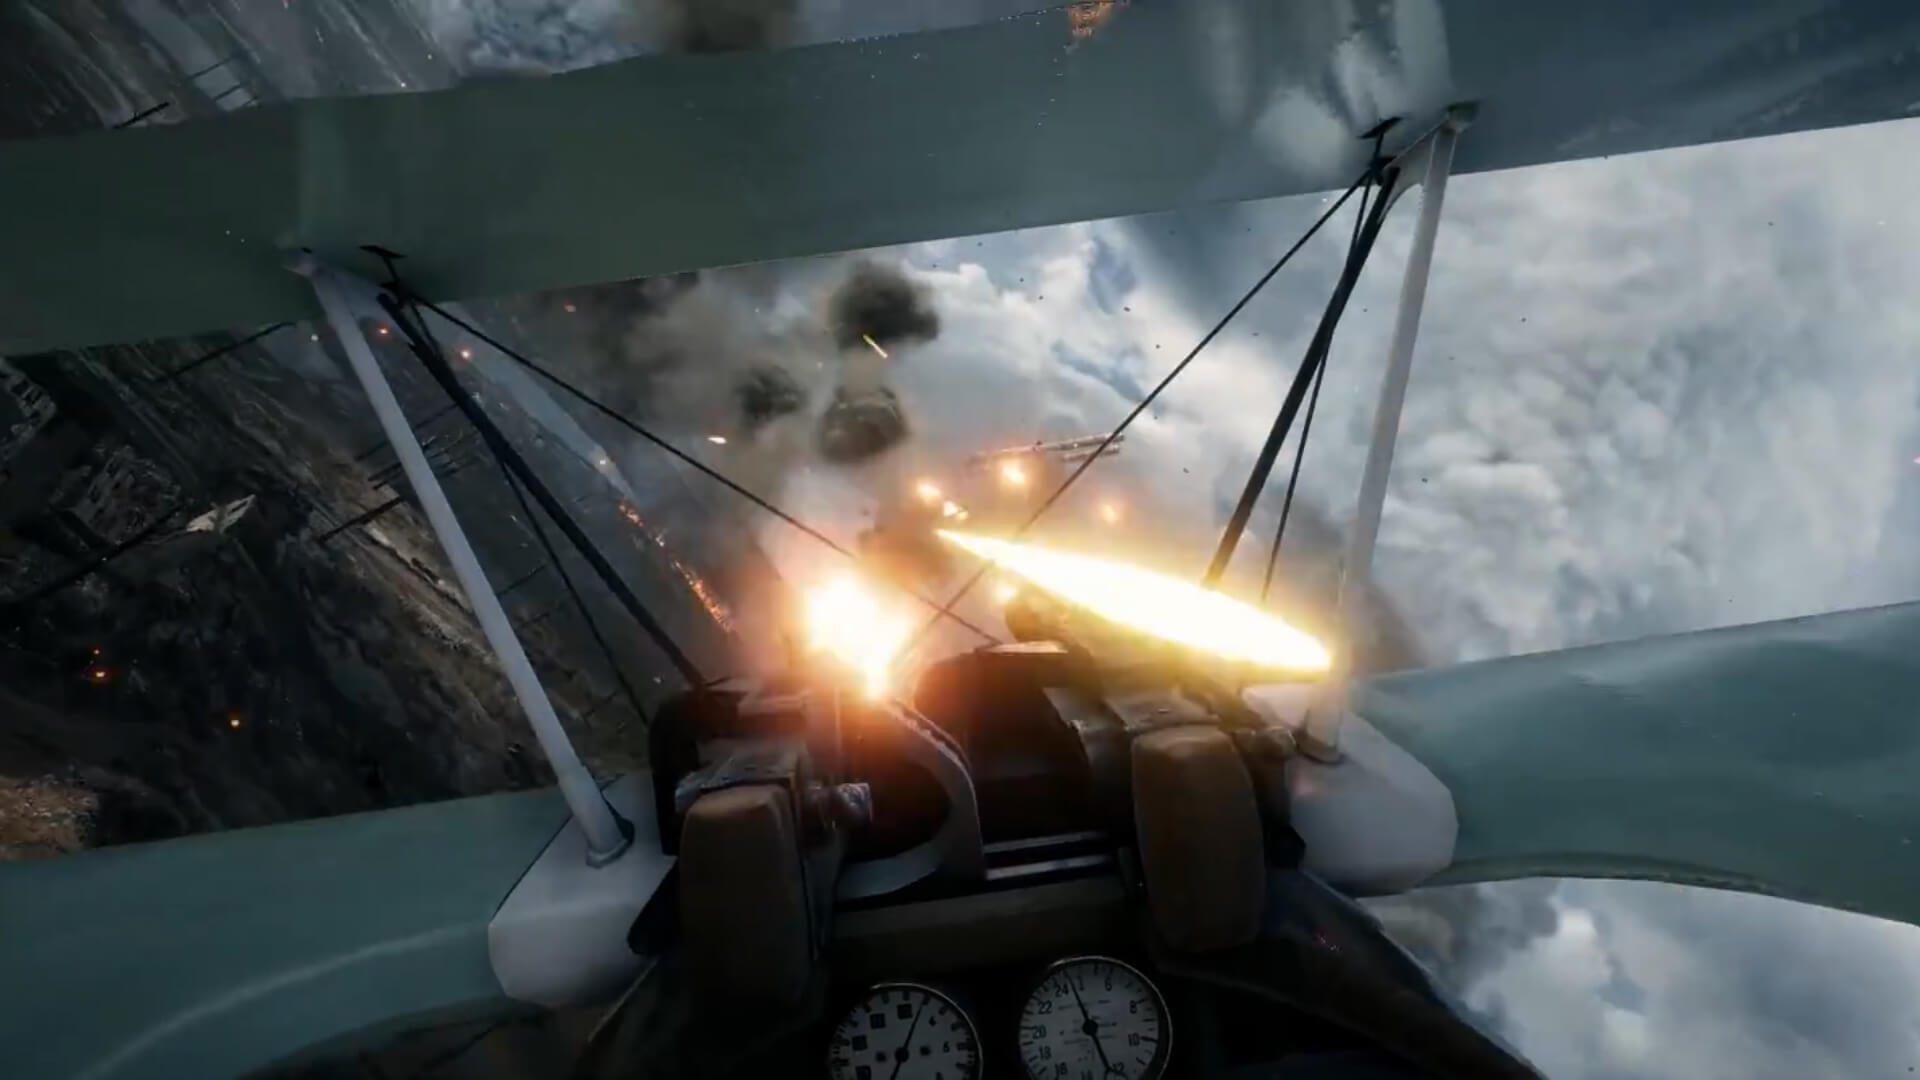 Battlefield 1 System Requirements and Tech Details – Battlefield